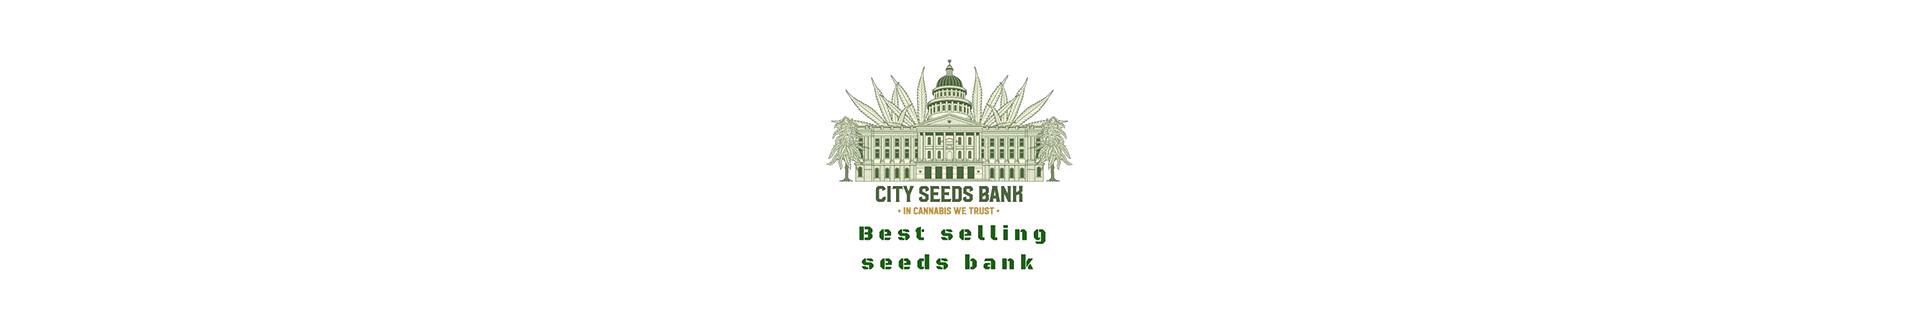 City Seeds Bank